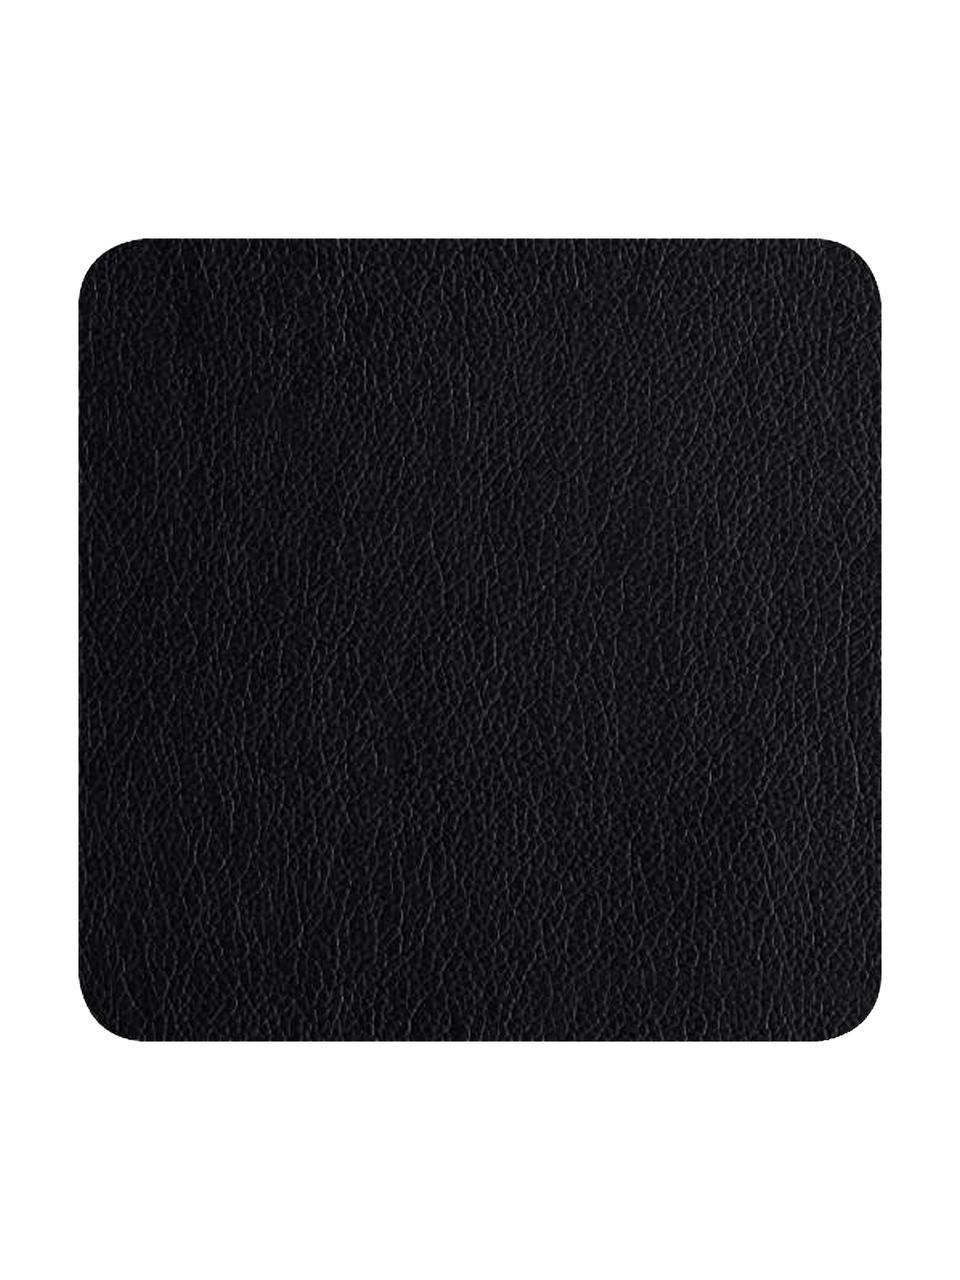 Sottobicchiere quadrato in similpelle nera Pik 4 pz, Materiale sintetico (PVC), Nero, Larg. 10 x Lung. 10 cm